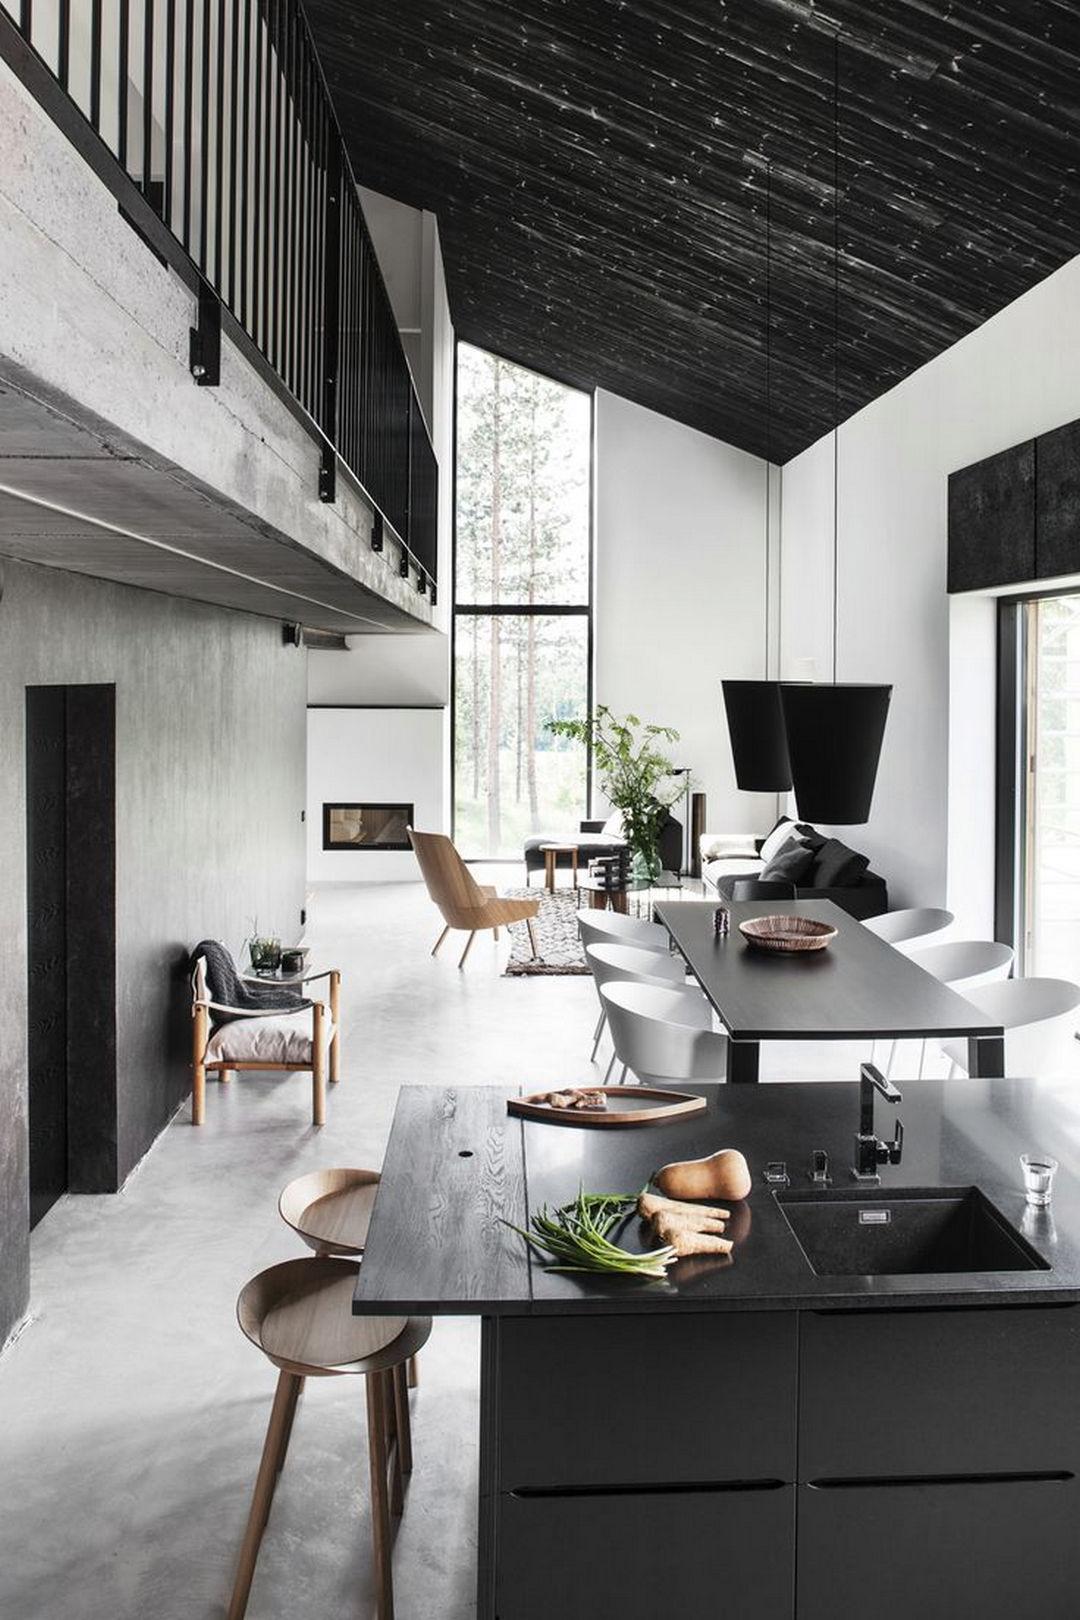 64 Sleek Modern Interior Decorating Ideas | Modern interior ...